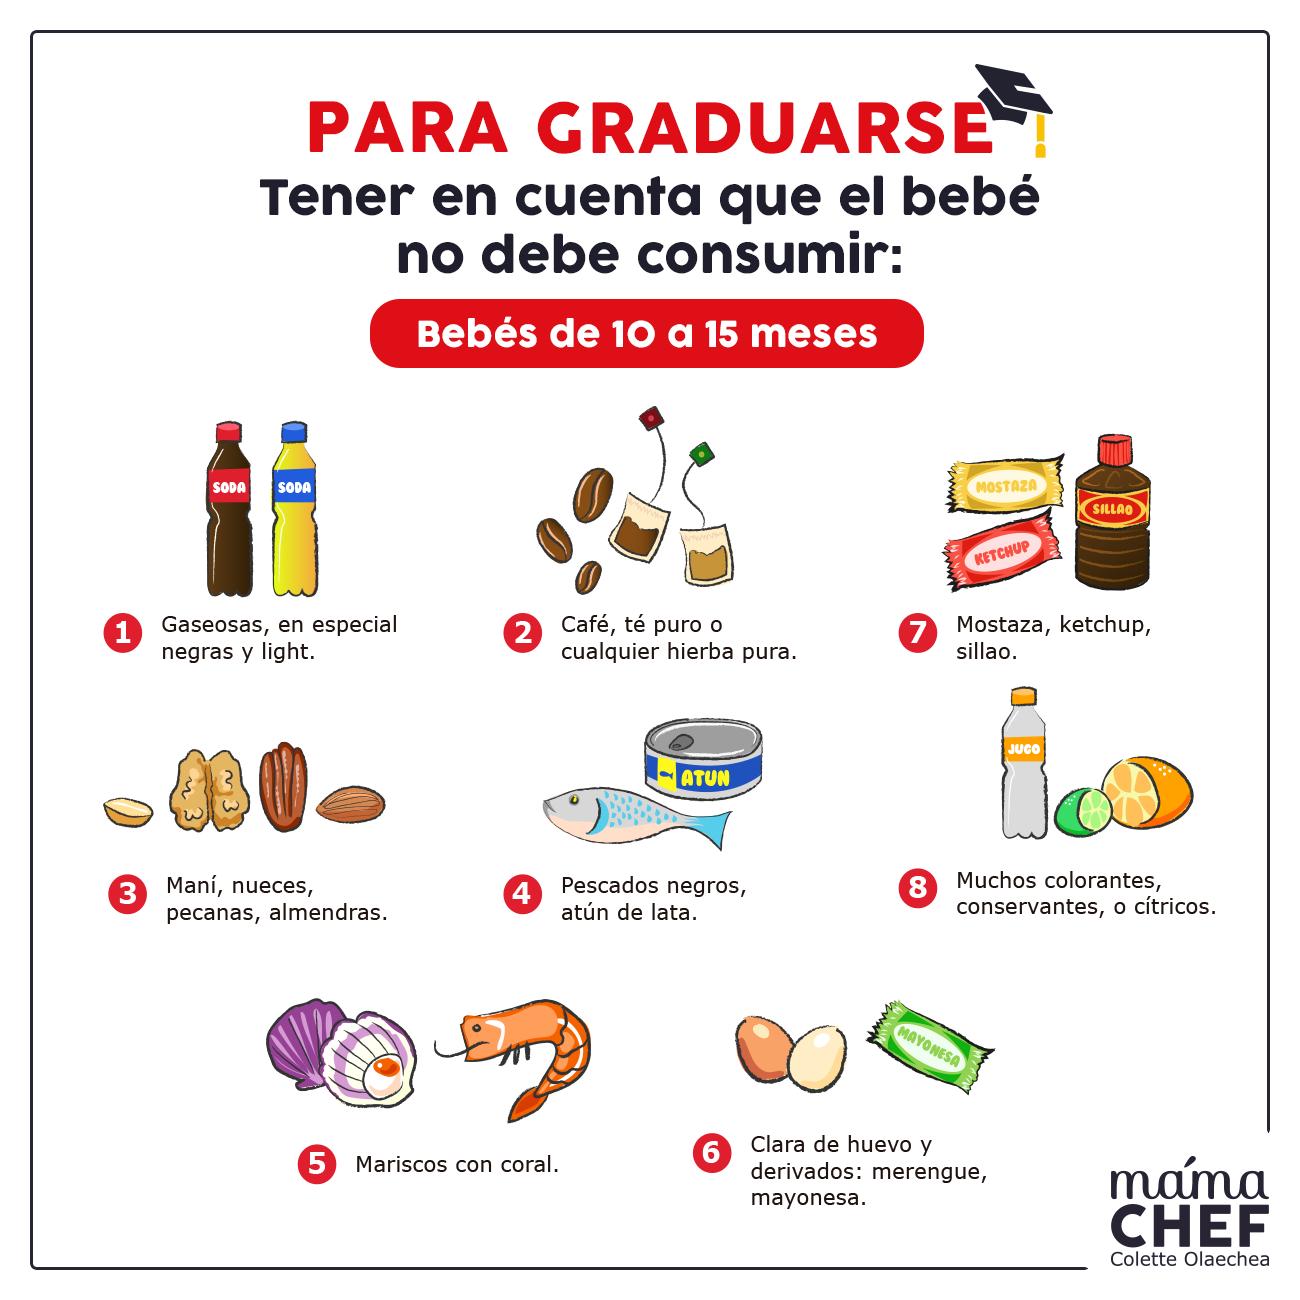 recomendaciones para bebés de 19 a 15 meses Mamá Chef Colette Olaechea